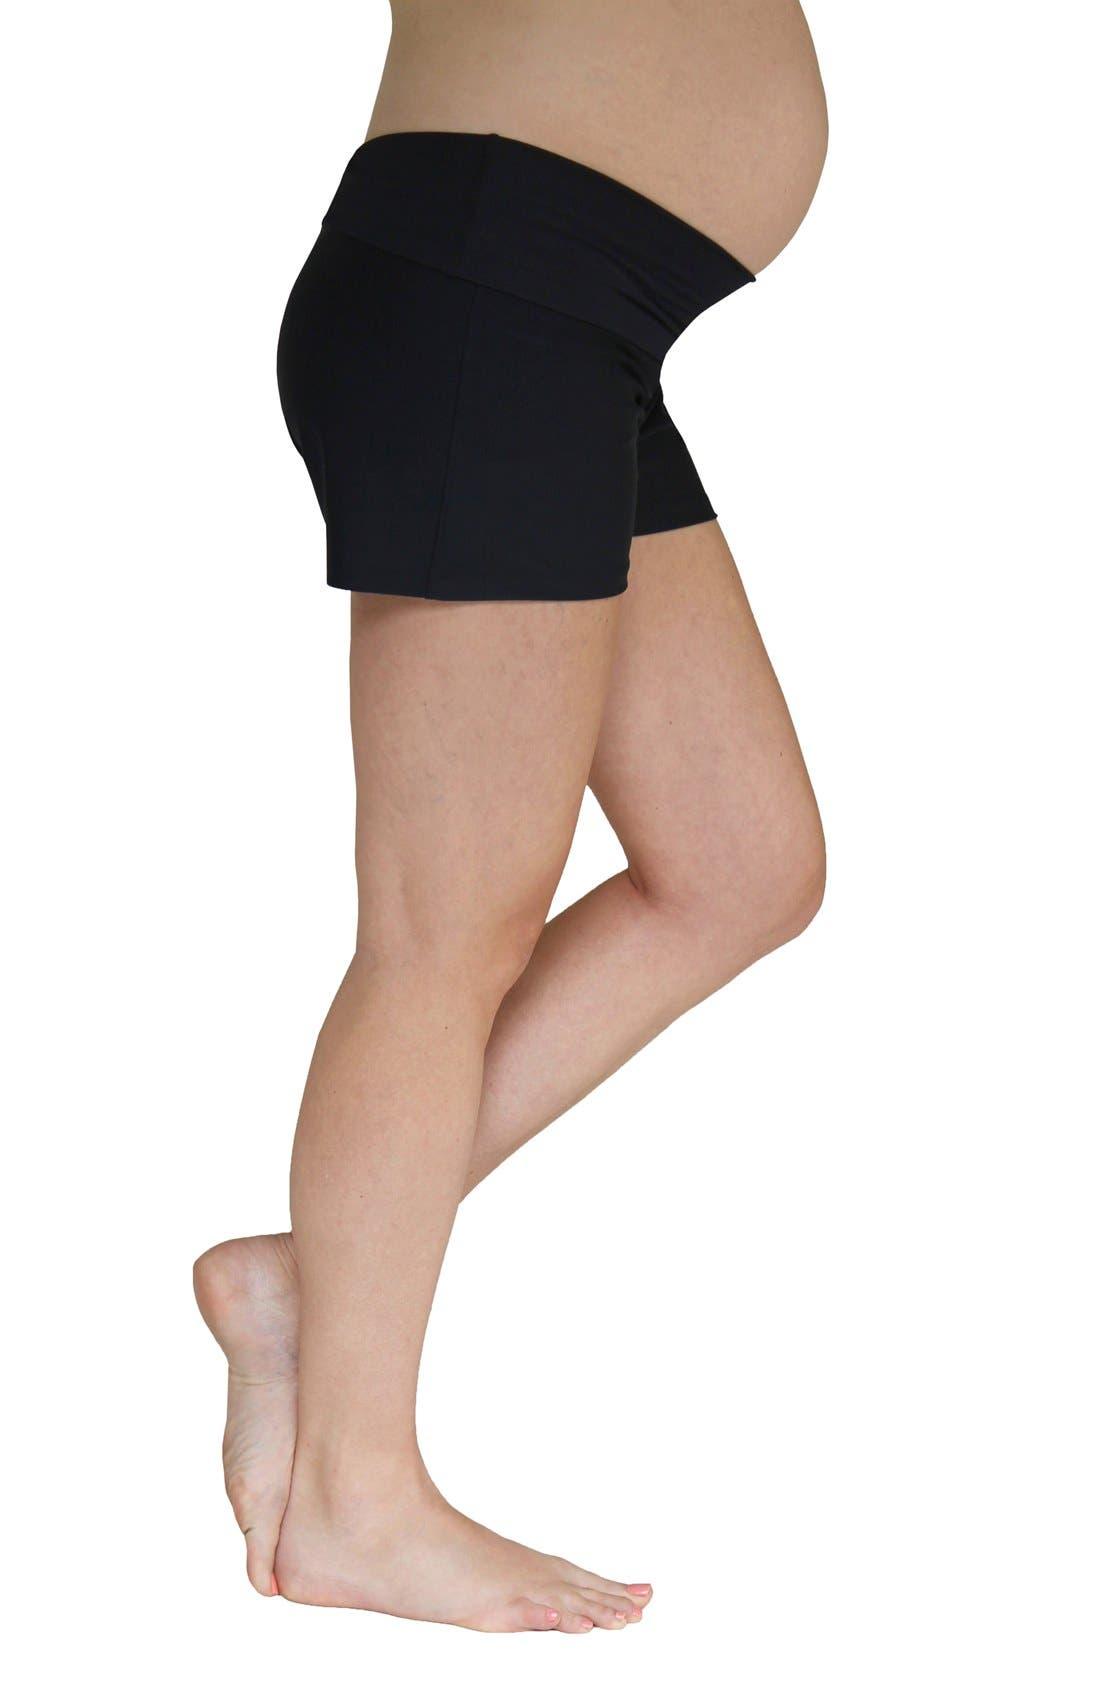 MERMAID MATERNITY Foldover Maternity Swim Shorts